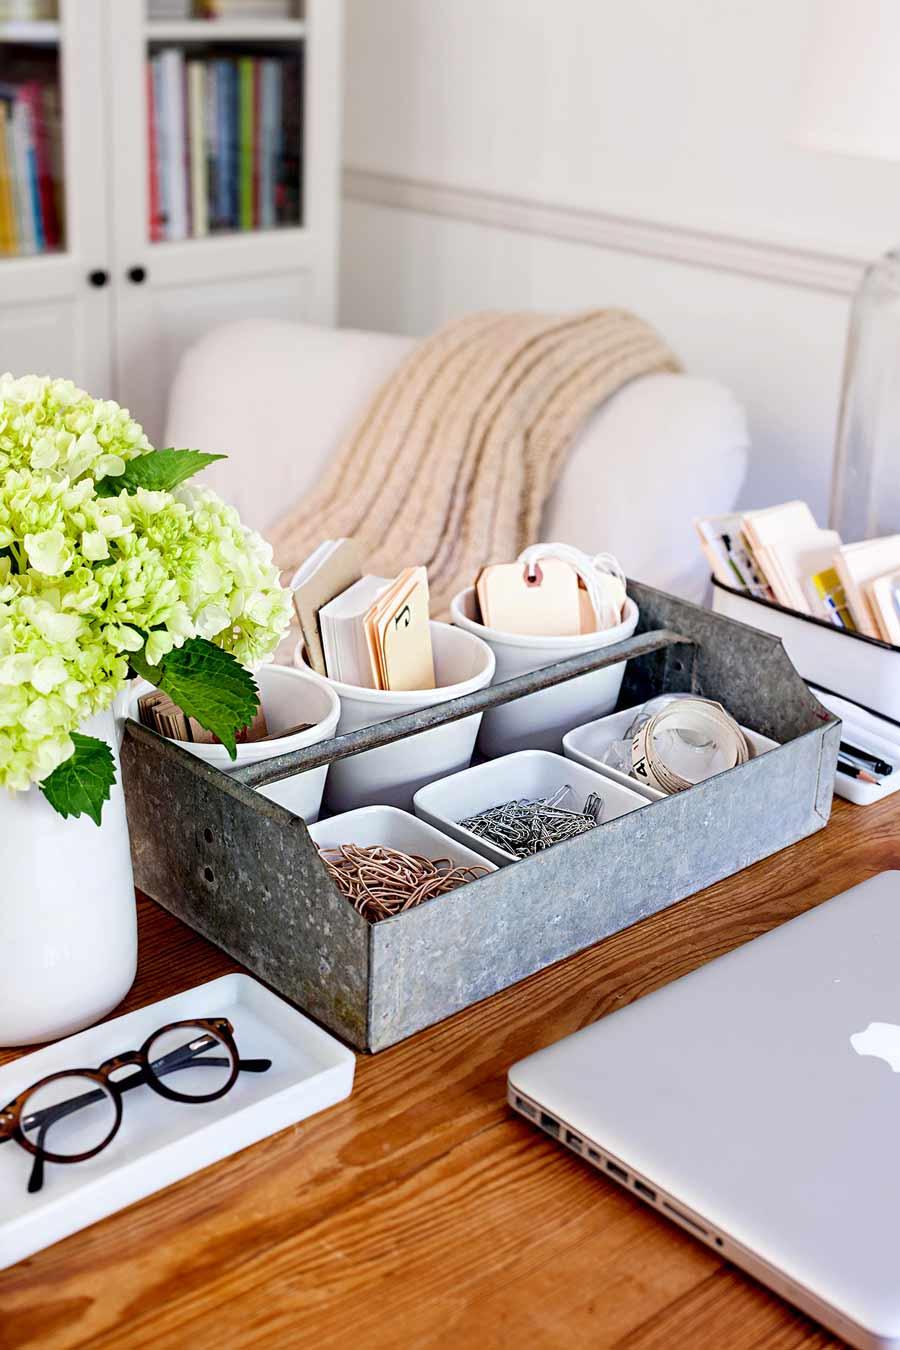 فضای ذخیره سازی لوازم تحریر روی میز کاز